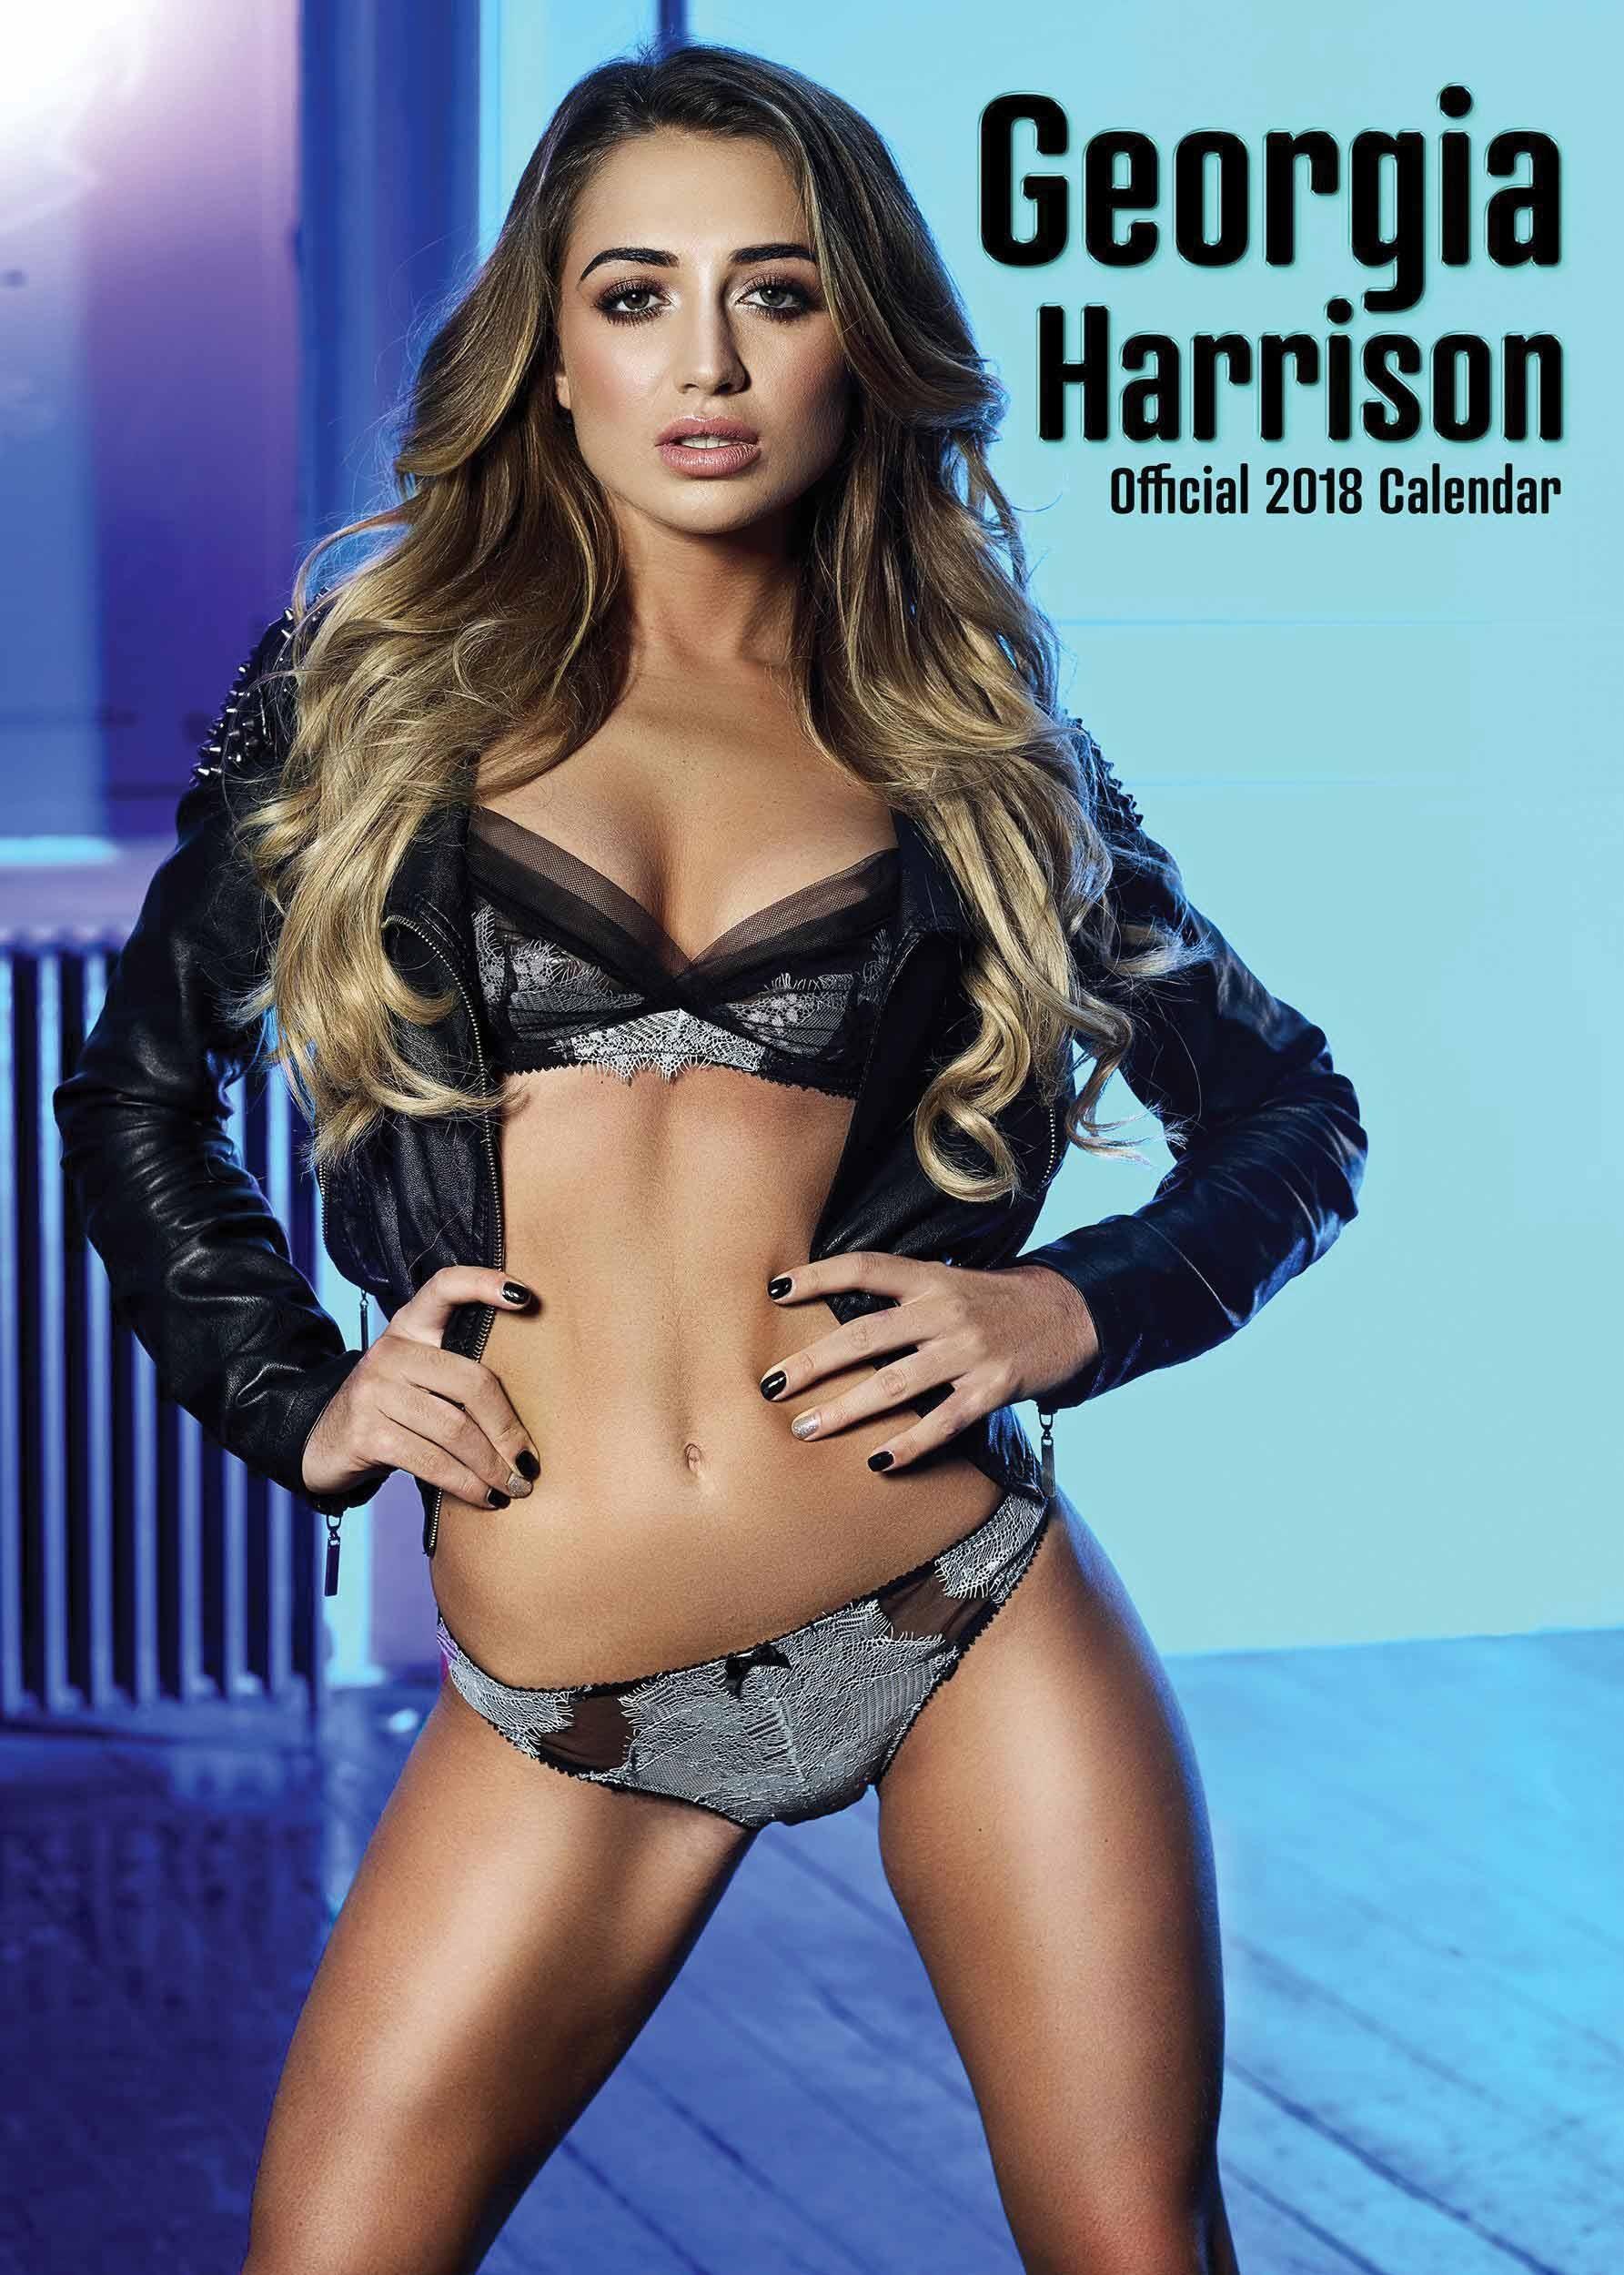 Georgia Harrison